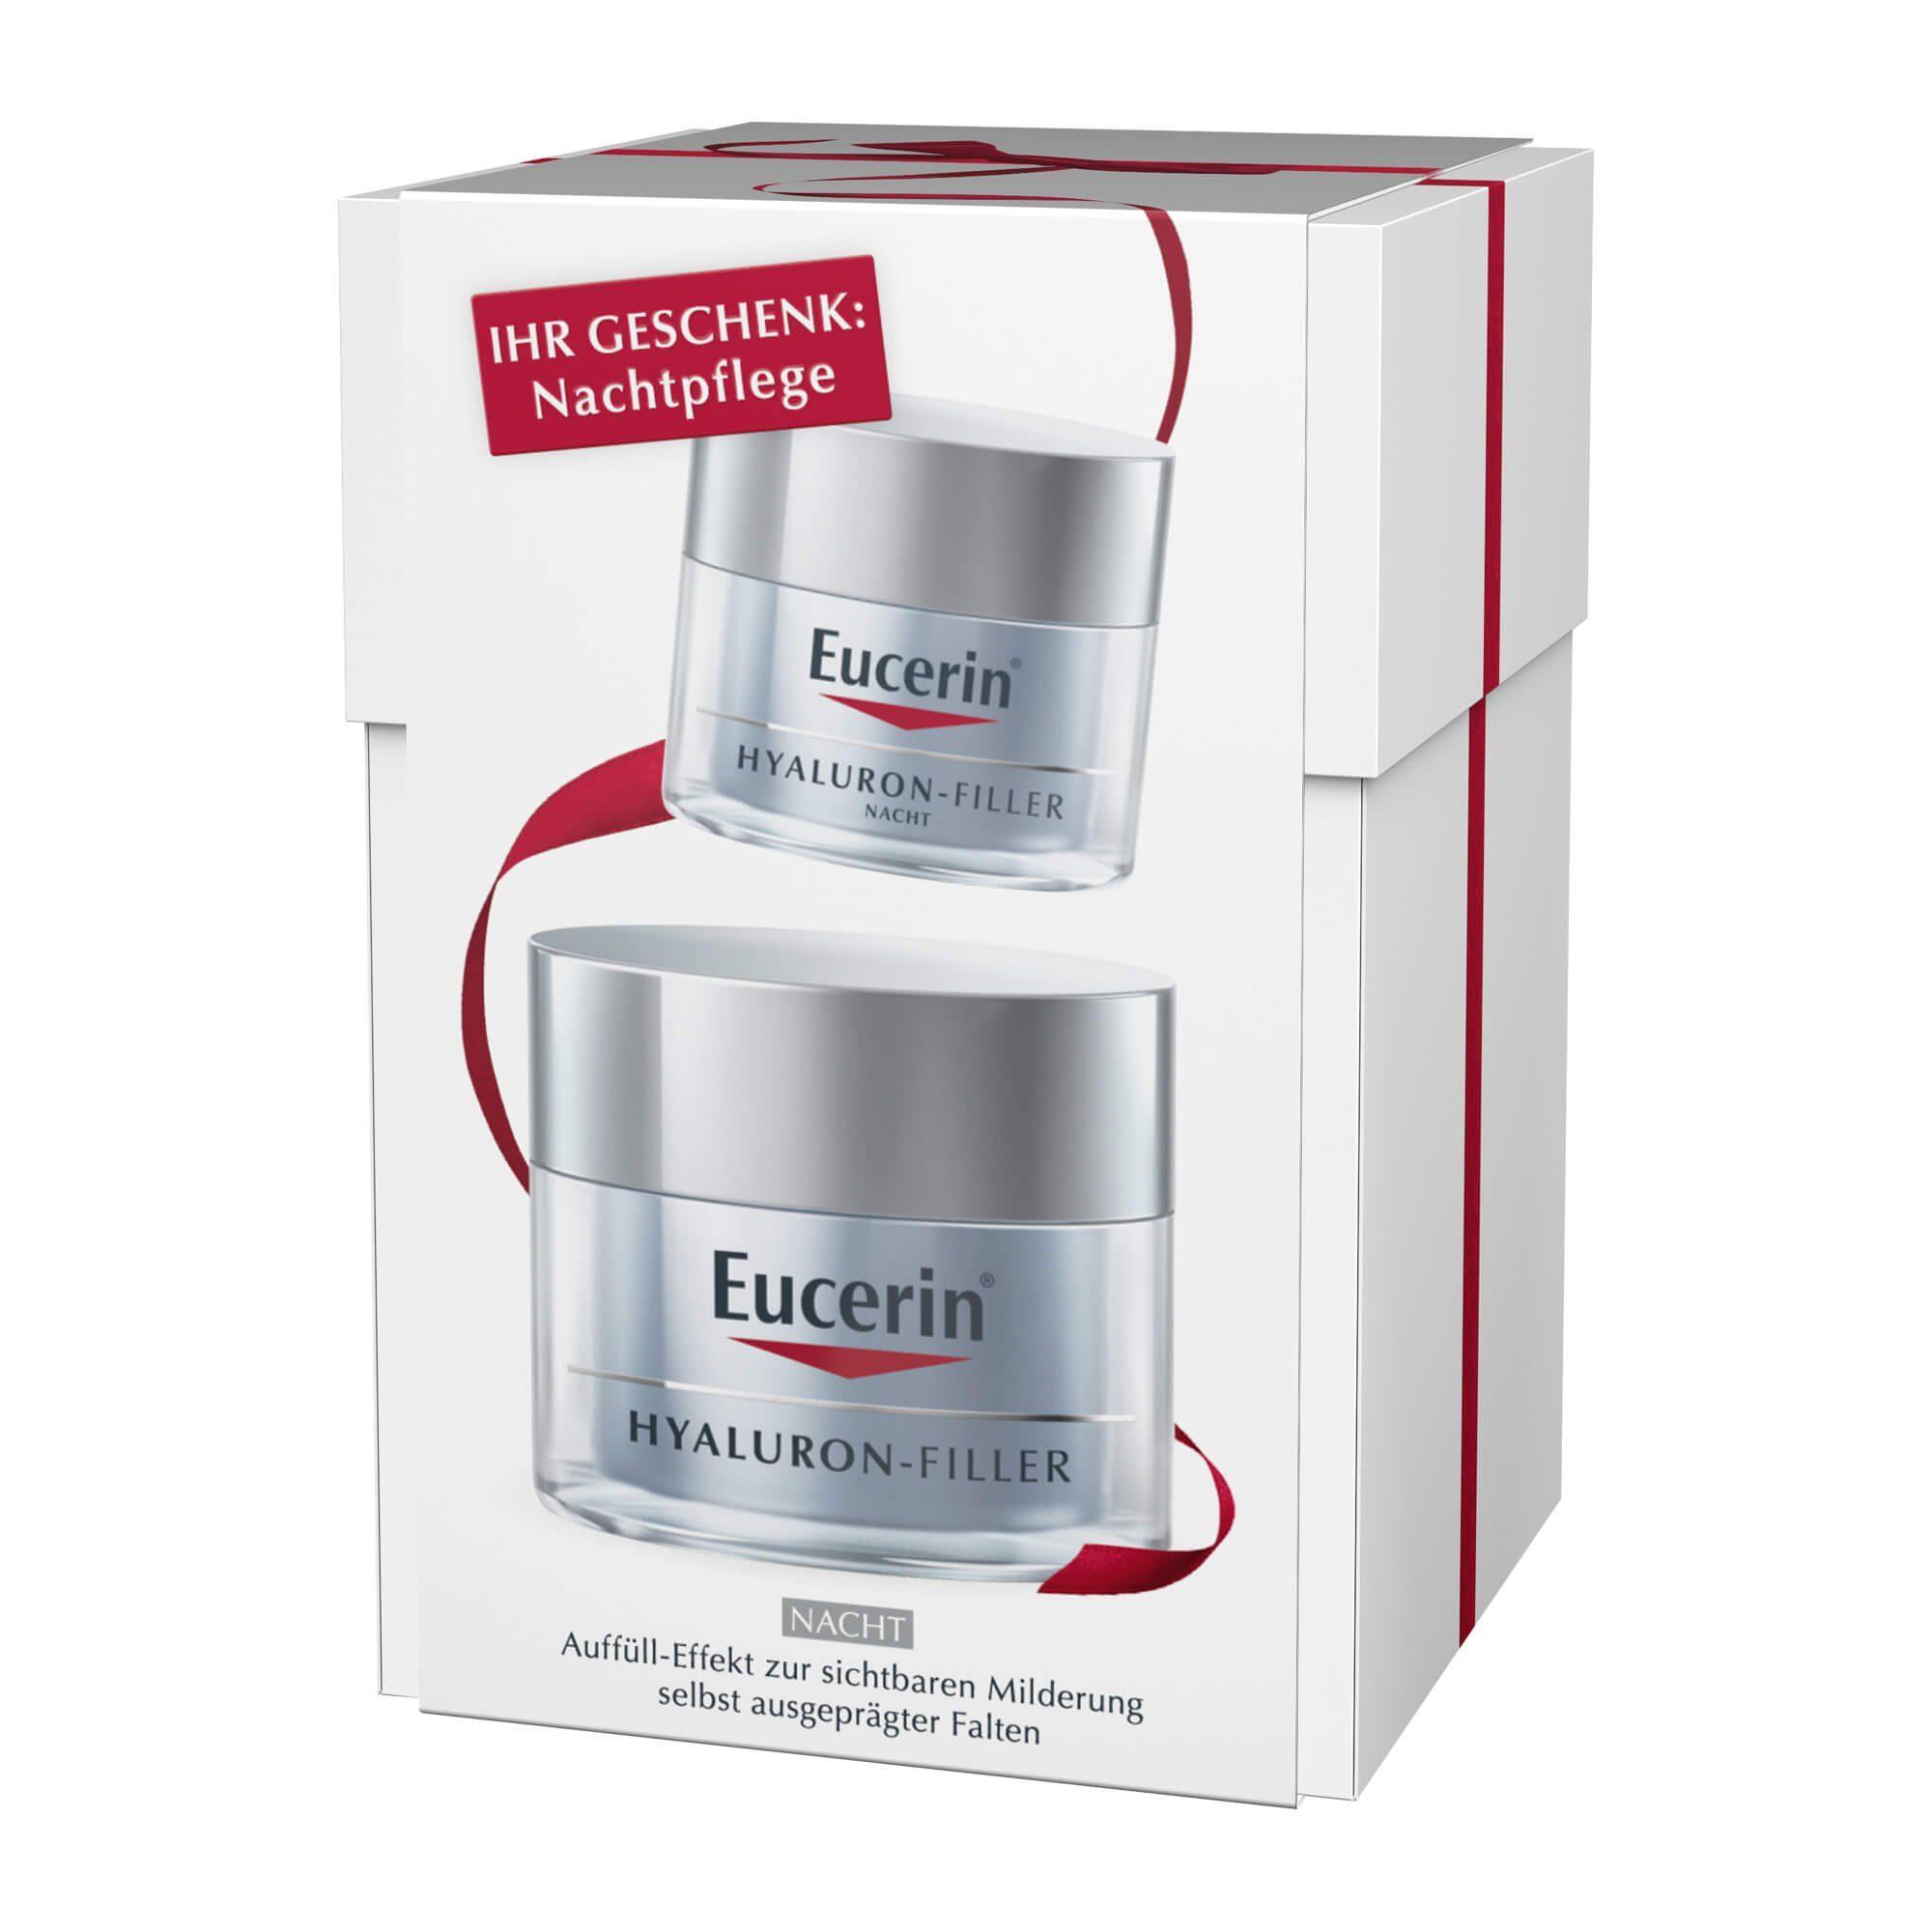 Eucerin Anti-Age Hyaluron Filler Nacht, 50 ml